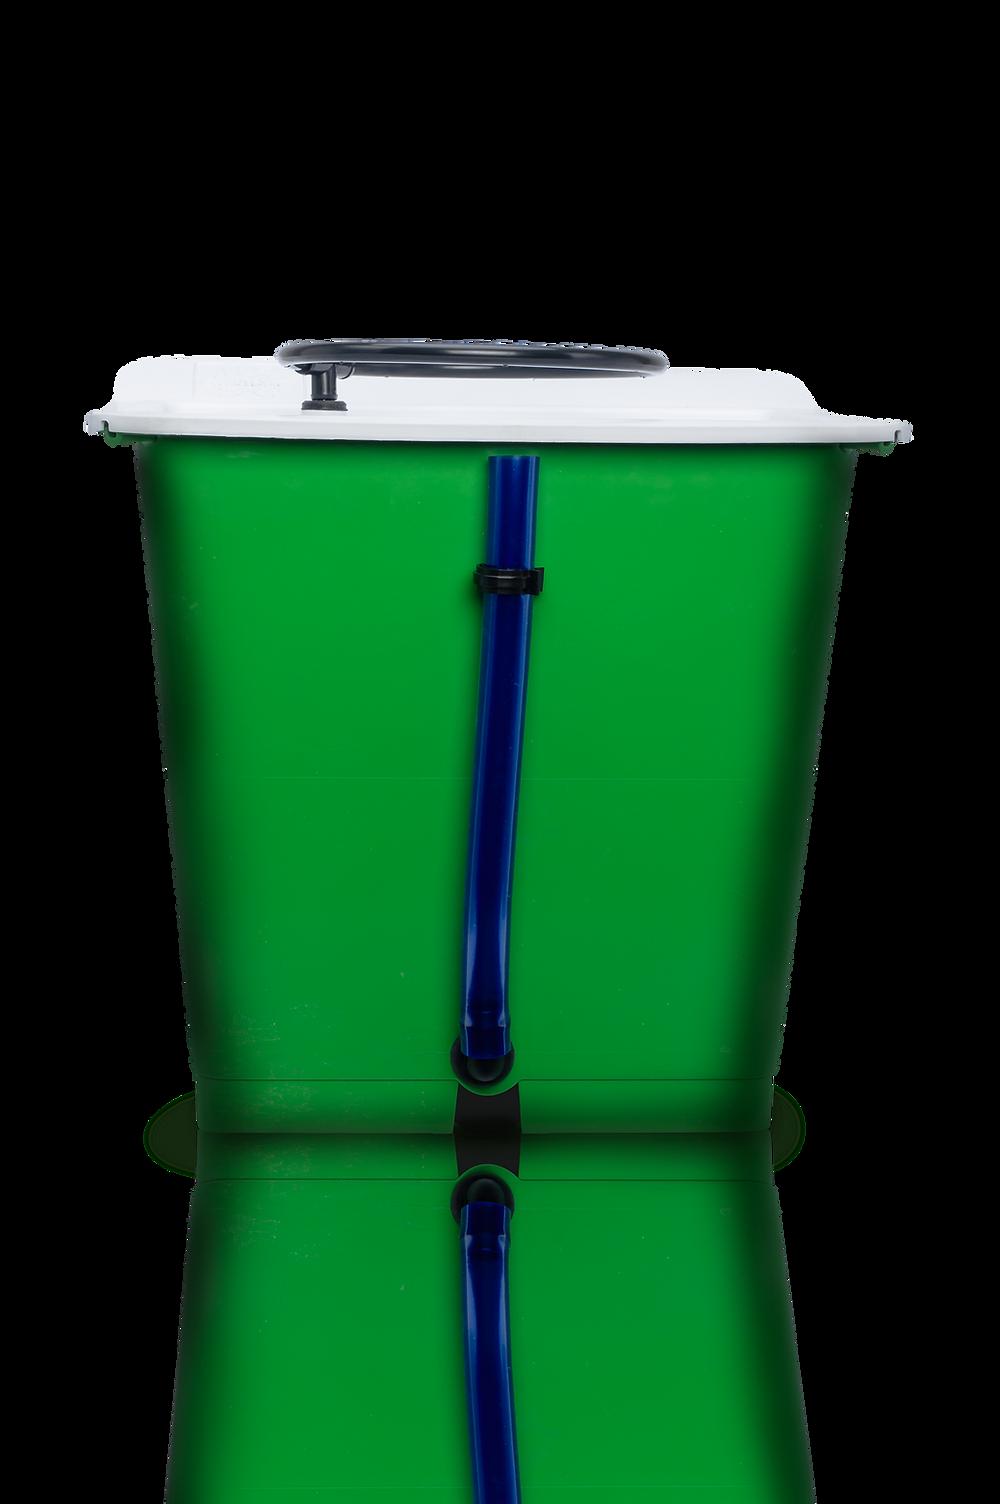 green man combi system 19mm